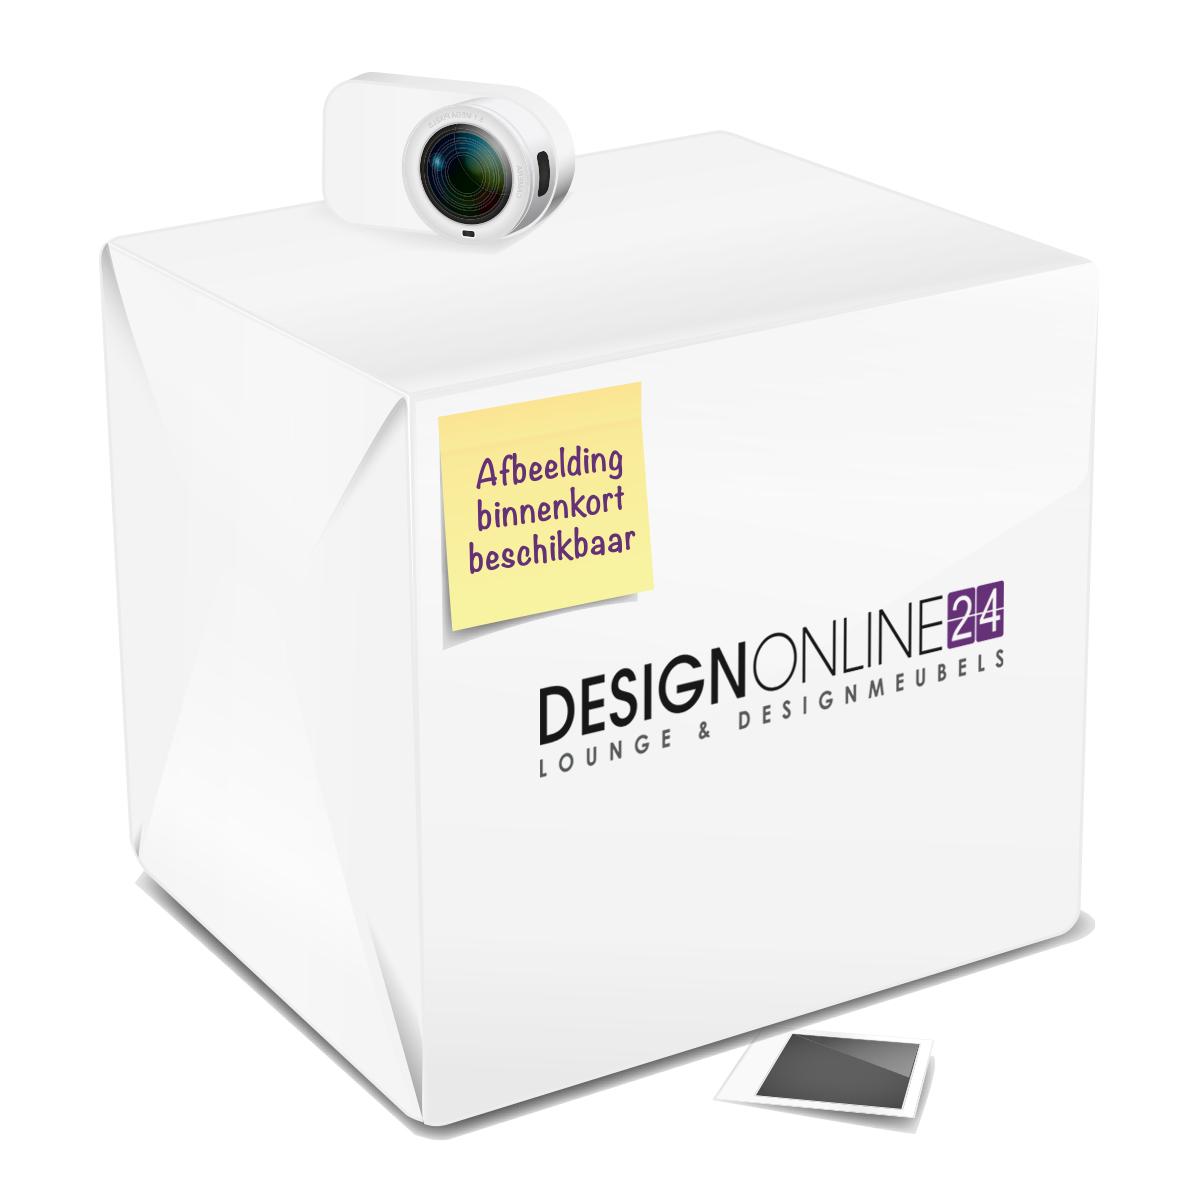 d-Bodhi d-Bodhi Fendy Locker Kast - 9 Deurs - L120 x B40 x H160 cm - Teakhout + Gratis Design Tafellamp twv € 79,95